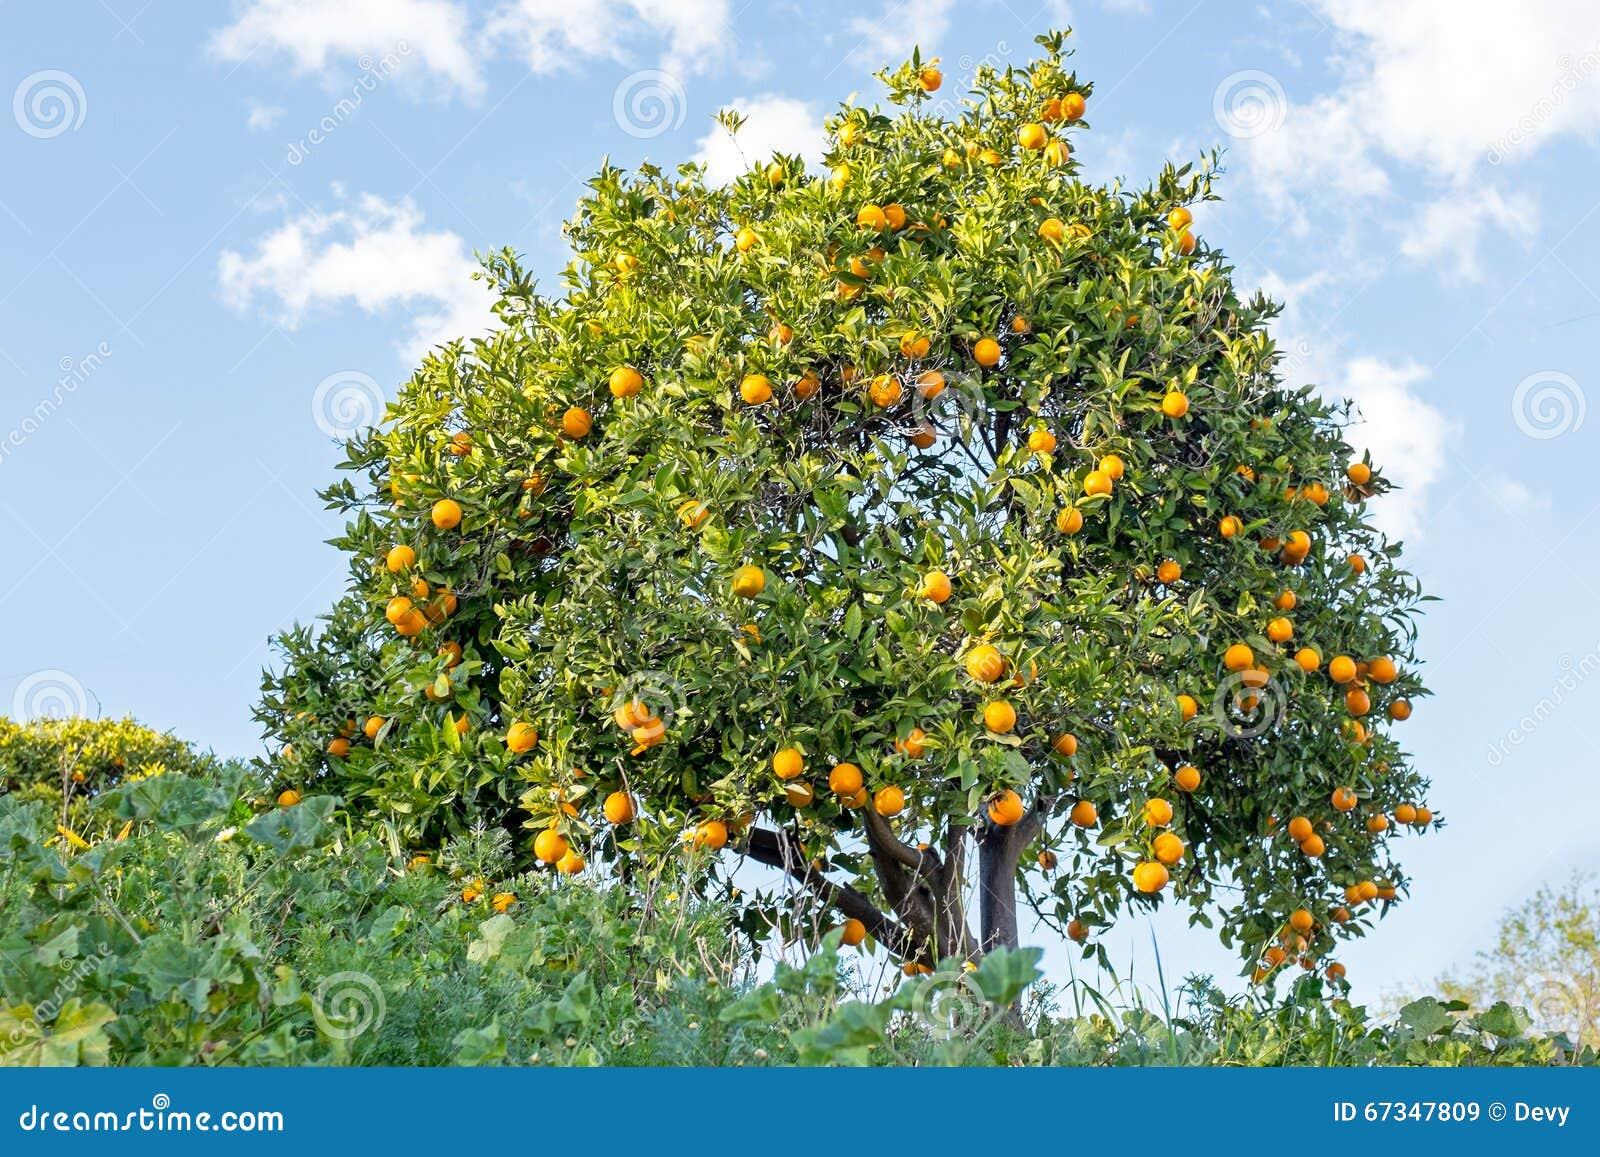 arbre orange dans la campagne du portugal image stock image du cultiv accroissement 67347809. Black Bedroom Furniture Sets. Home Design Ideas